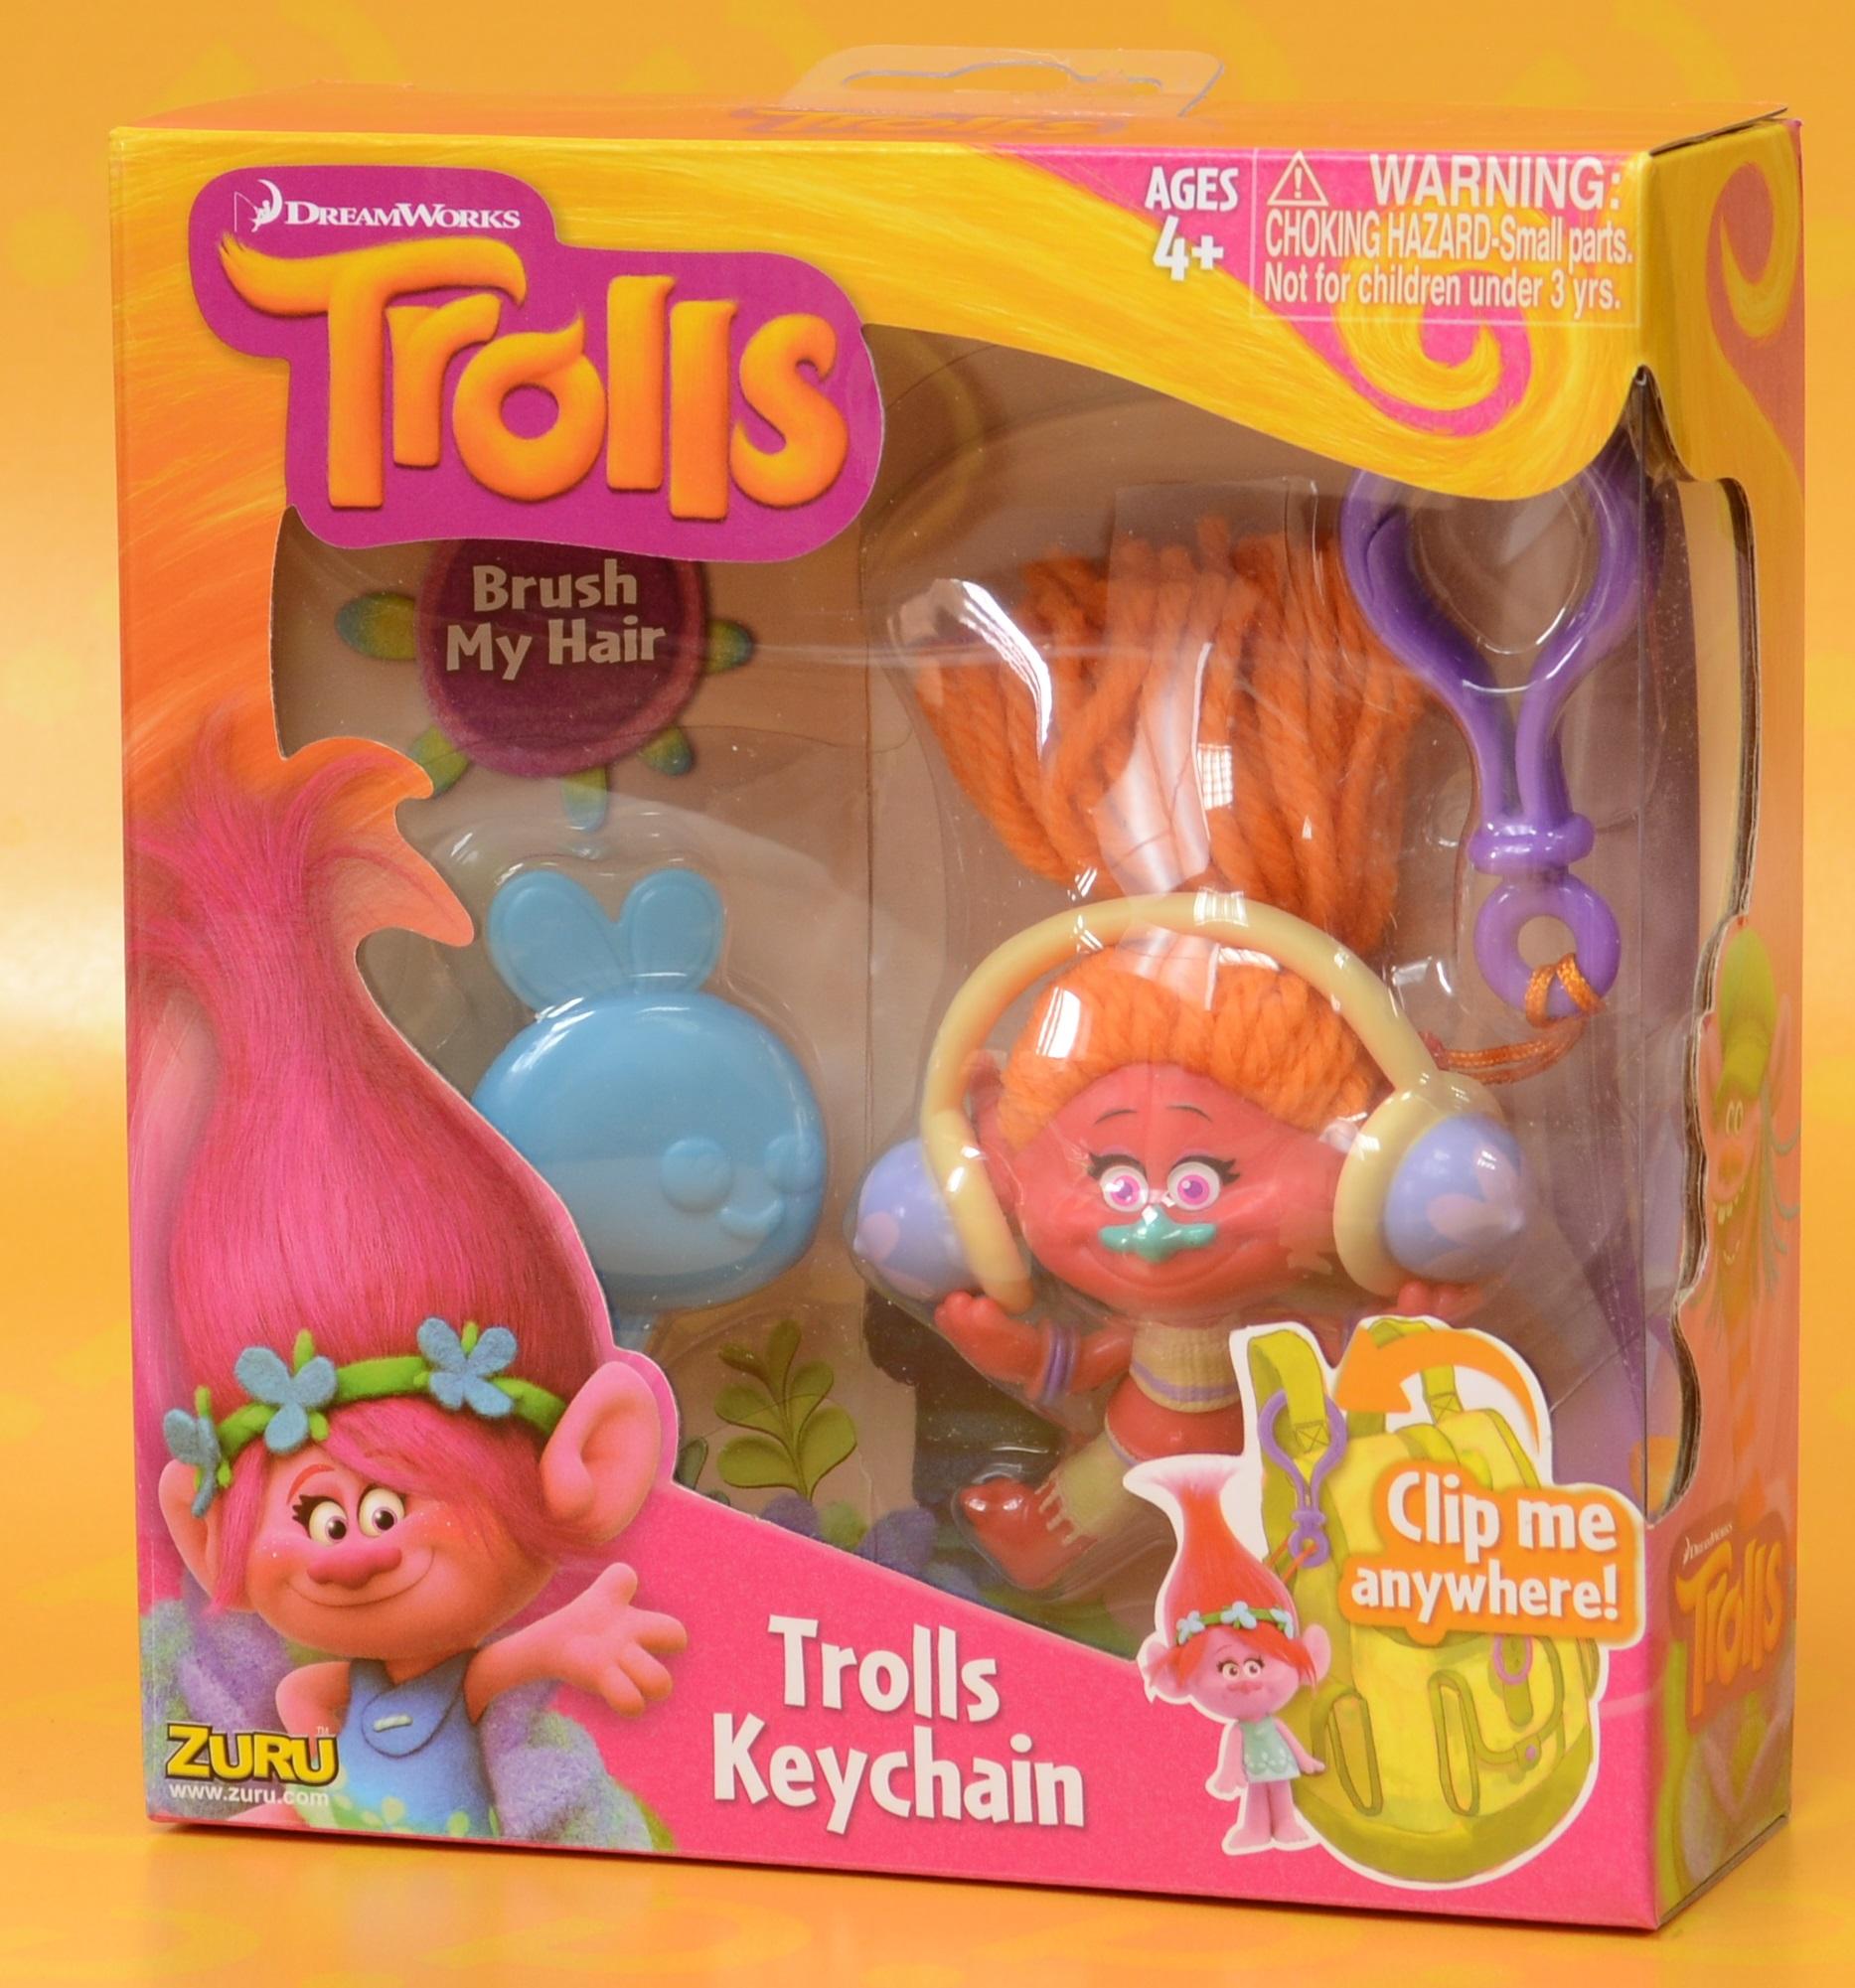 Брелок Trolls. Тролль DJ Звуки (DJ Suki)Представляем вашему вниманию брелок Trolls. Тролль DJ Звуки, созданную по мотивам анимационного фильма производства DreamWorks Animation.<br>